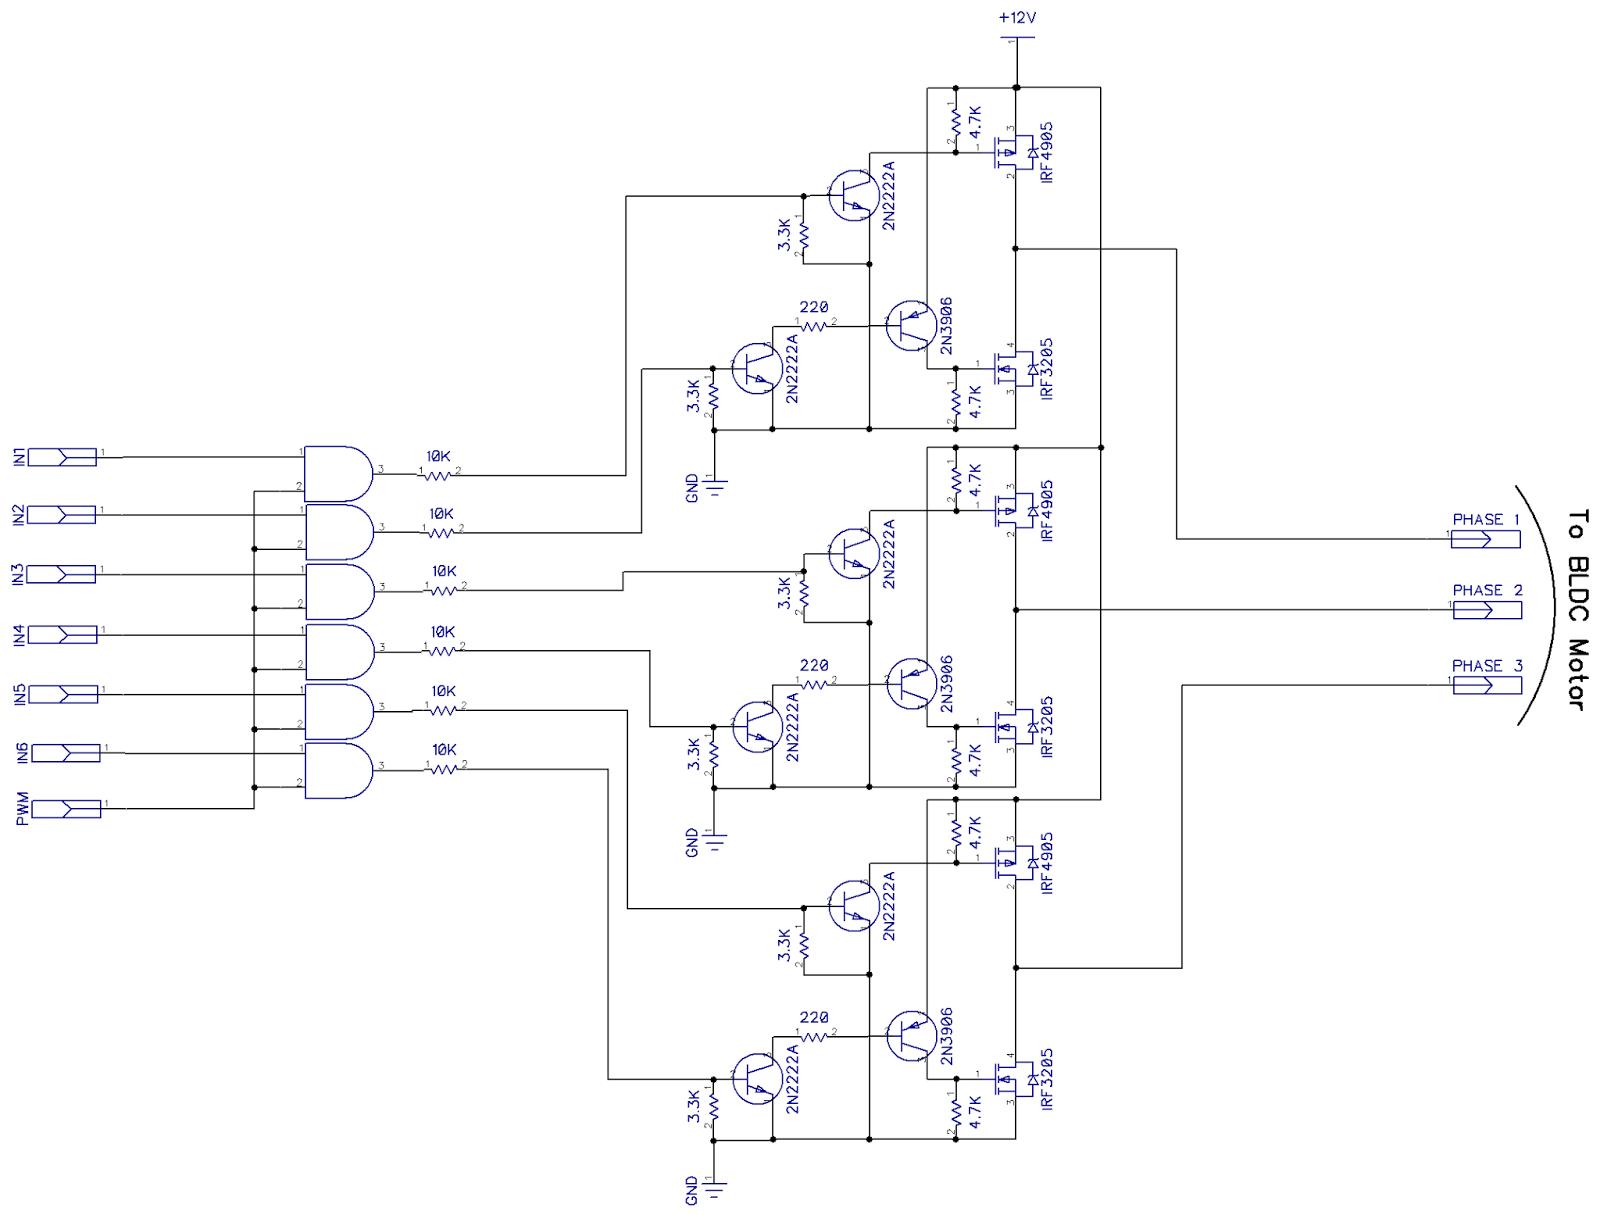 medium resolution of motor for furnace wiring diagram motor discover your wiring ups wiring diagram symbols